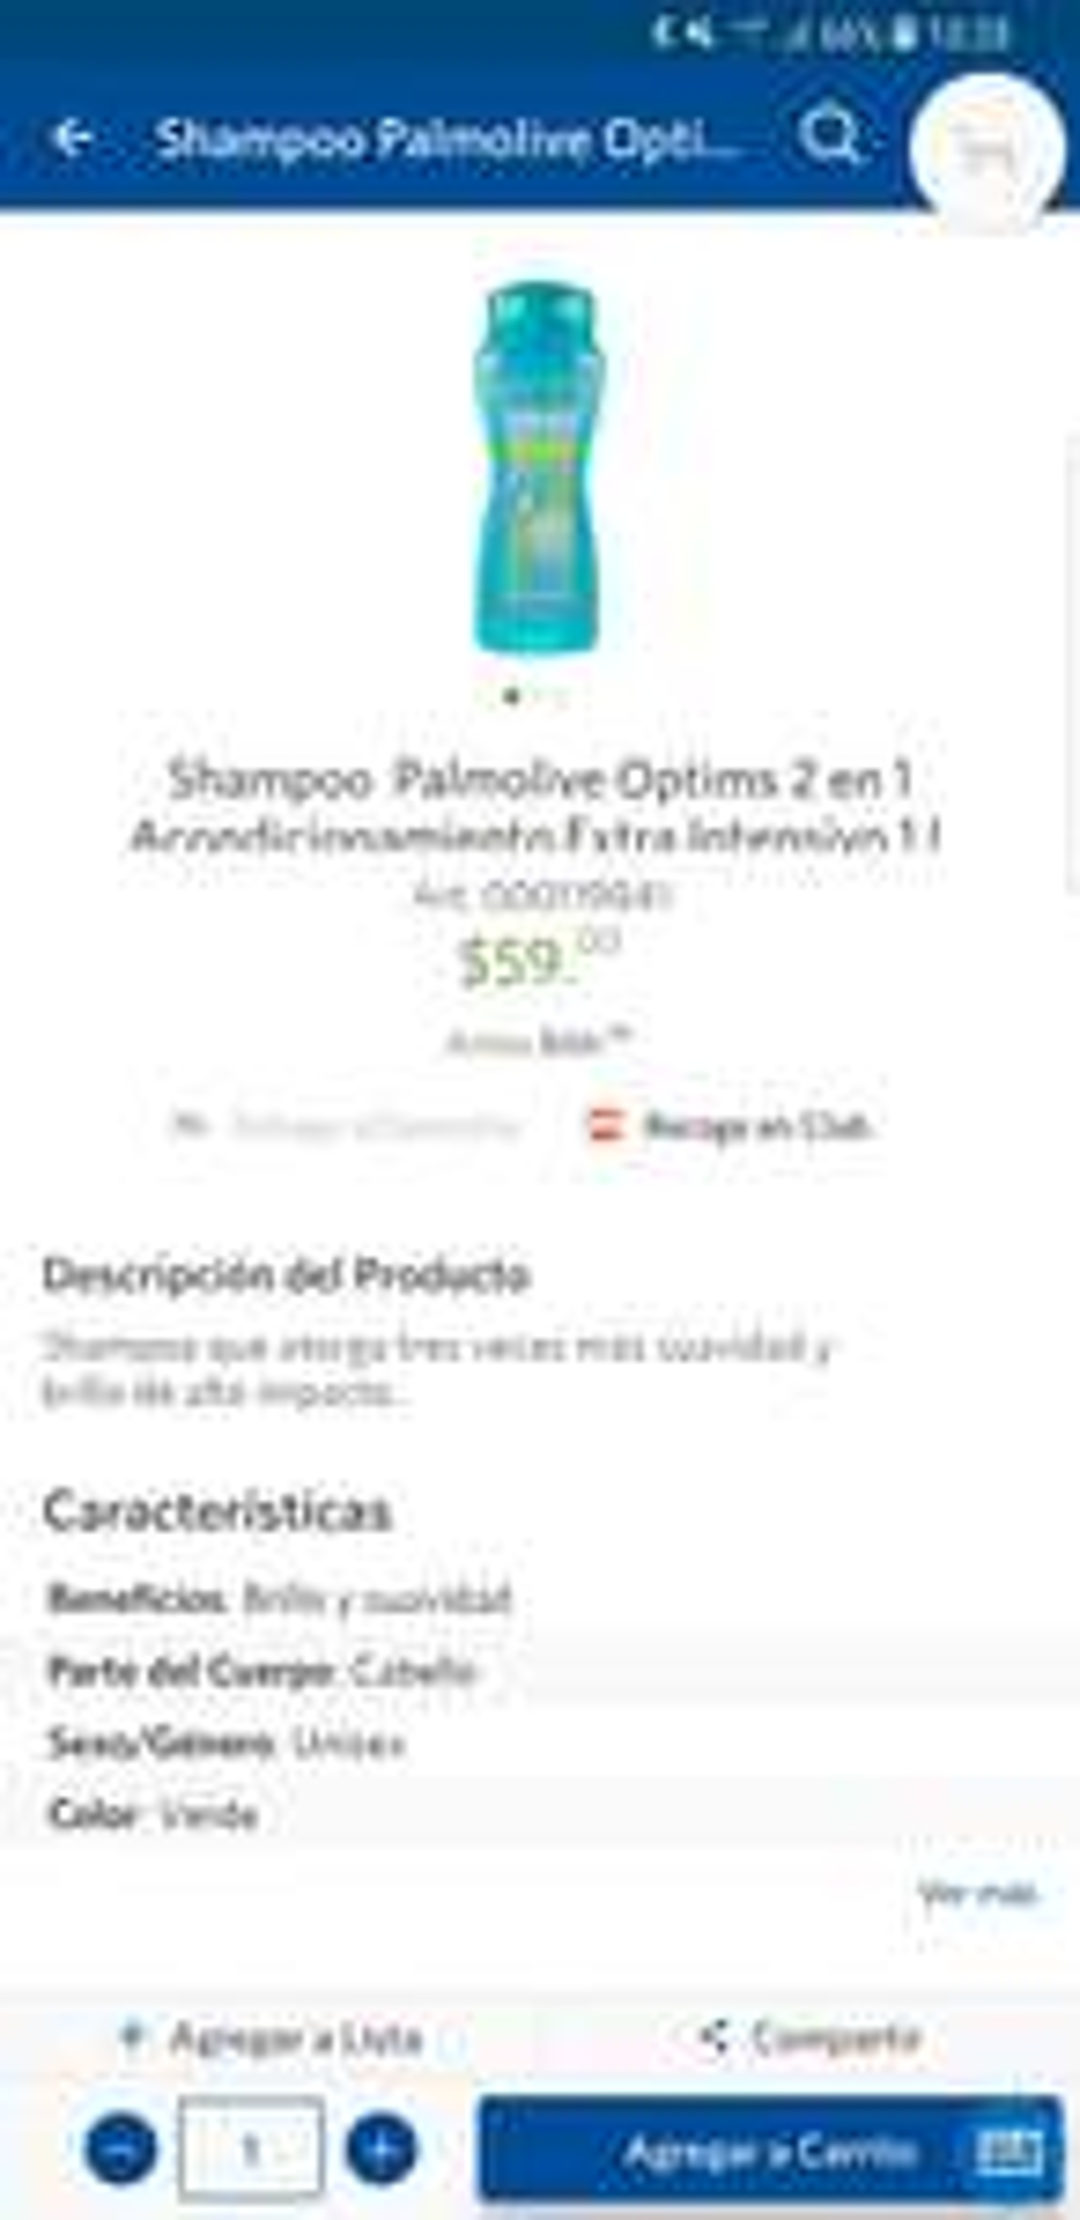 Sam's Club: Shampoo Palmolive Optims 2 en 1